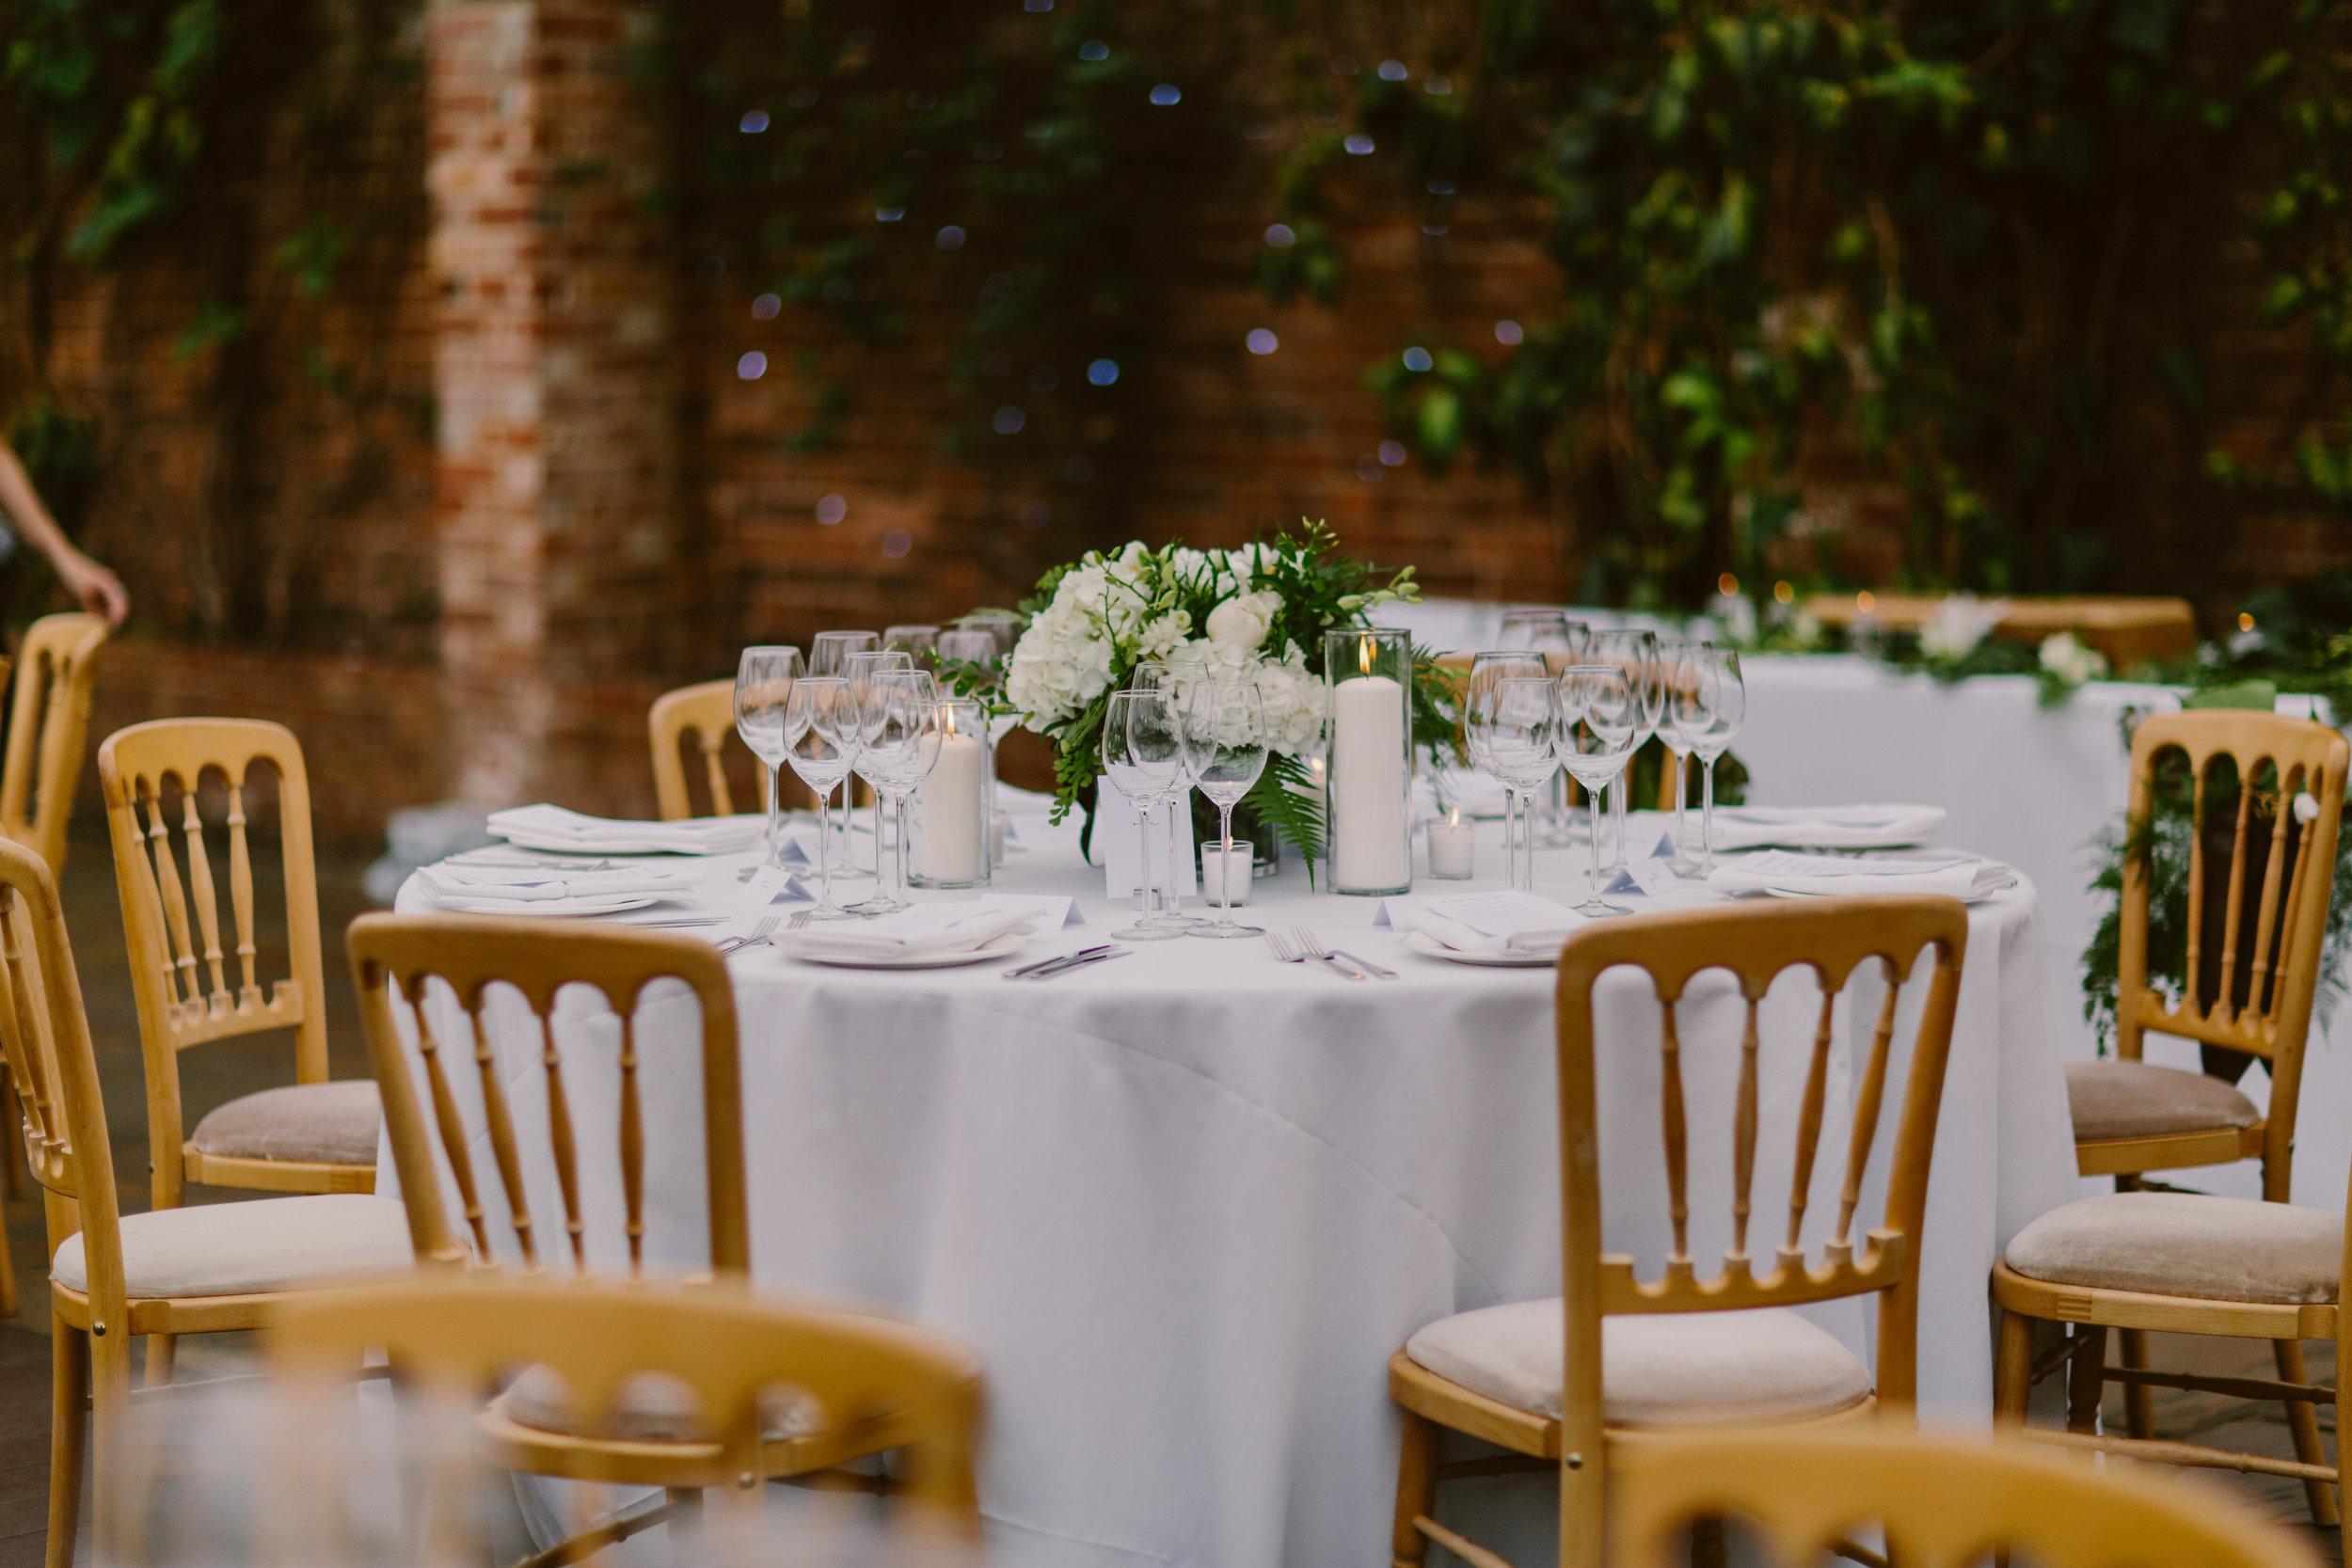 Nice bunch ethical floral design studio flower garden by Sula Northbrook Park wedding table arrangement